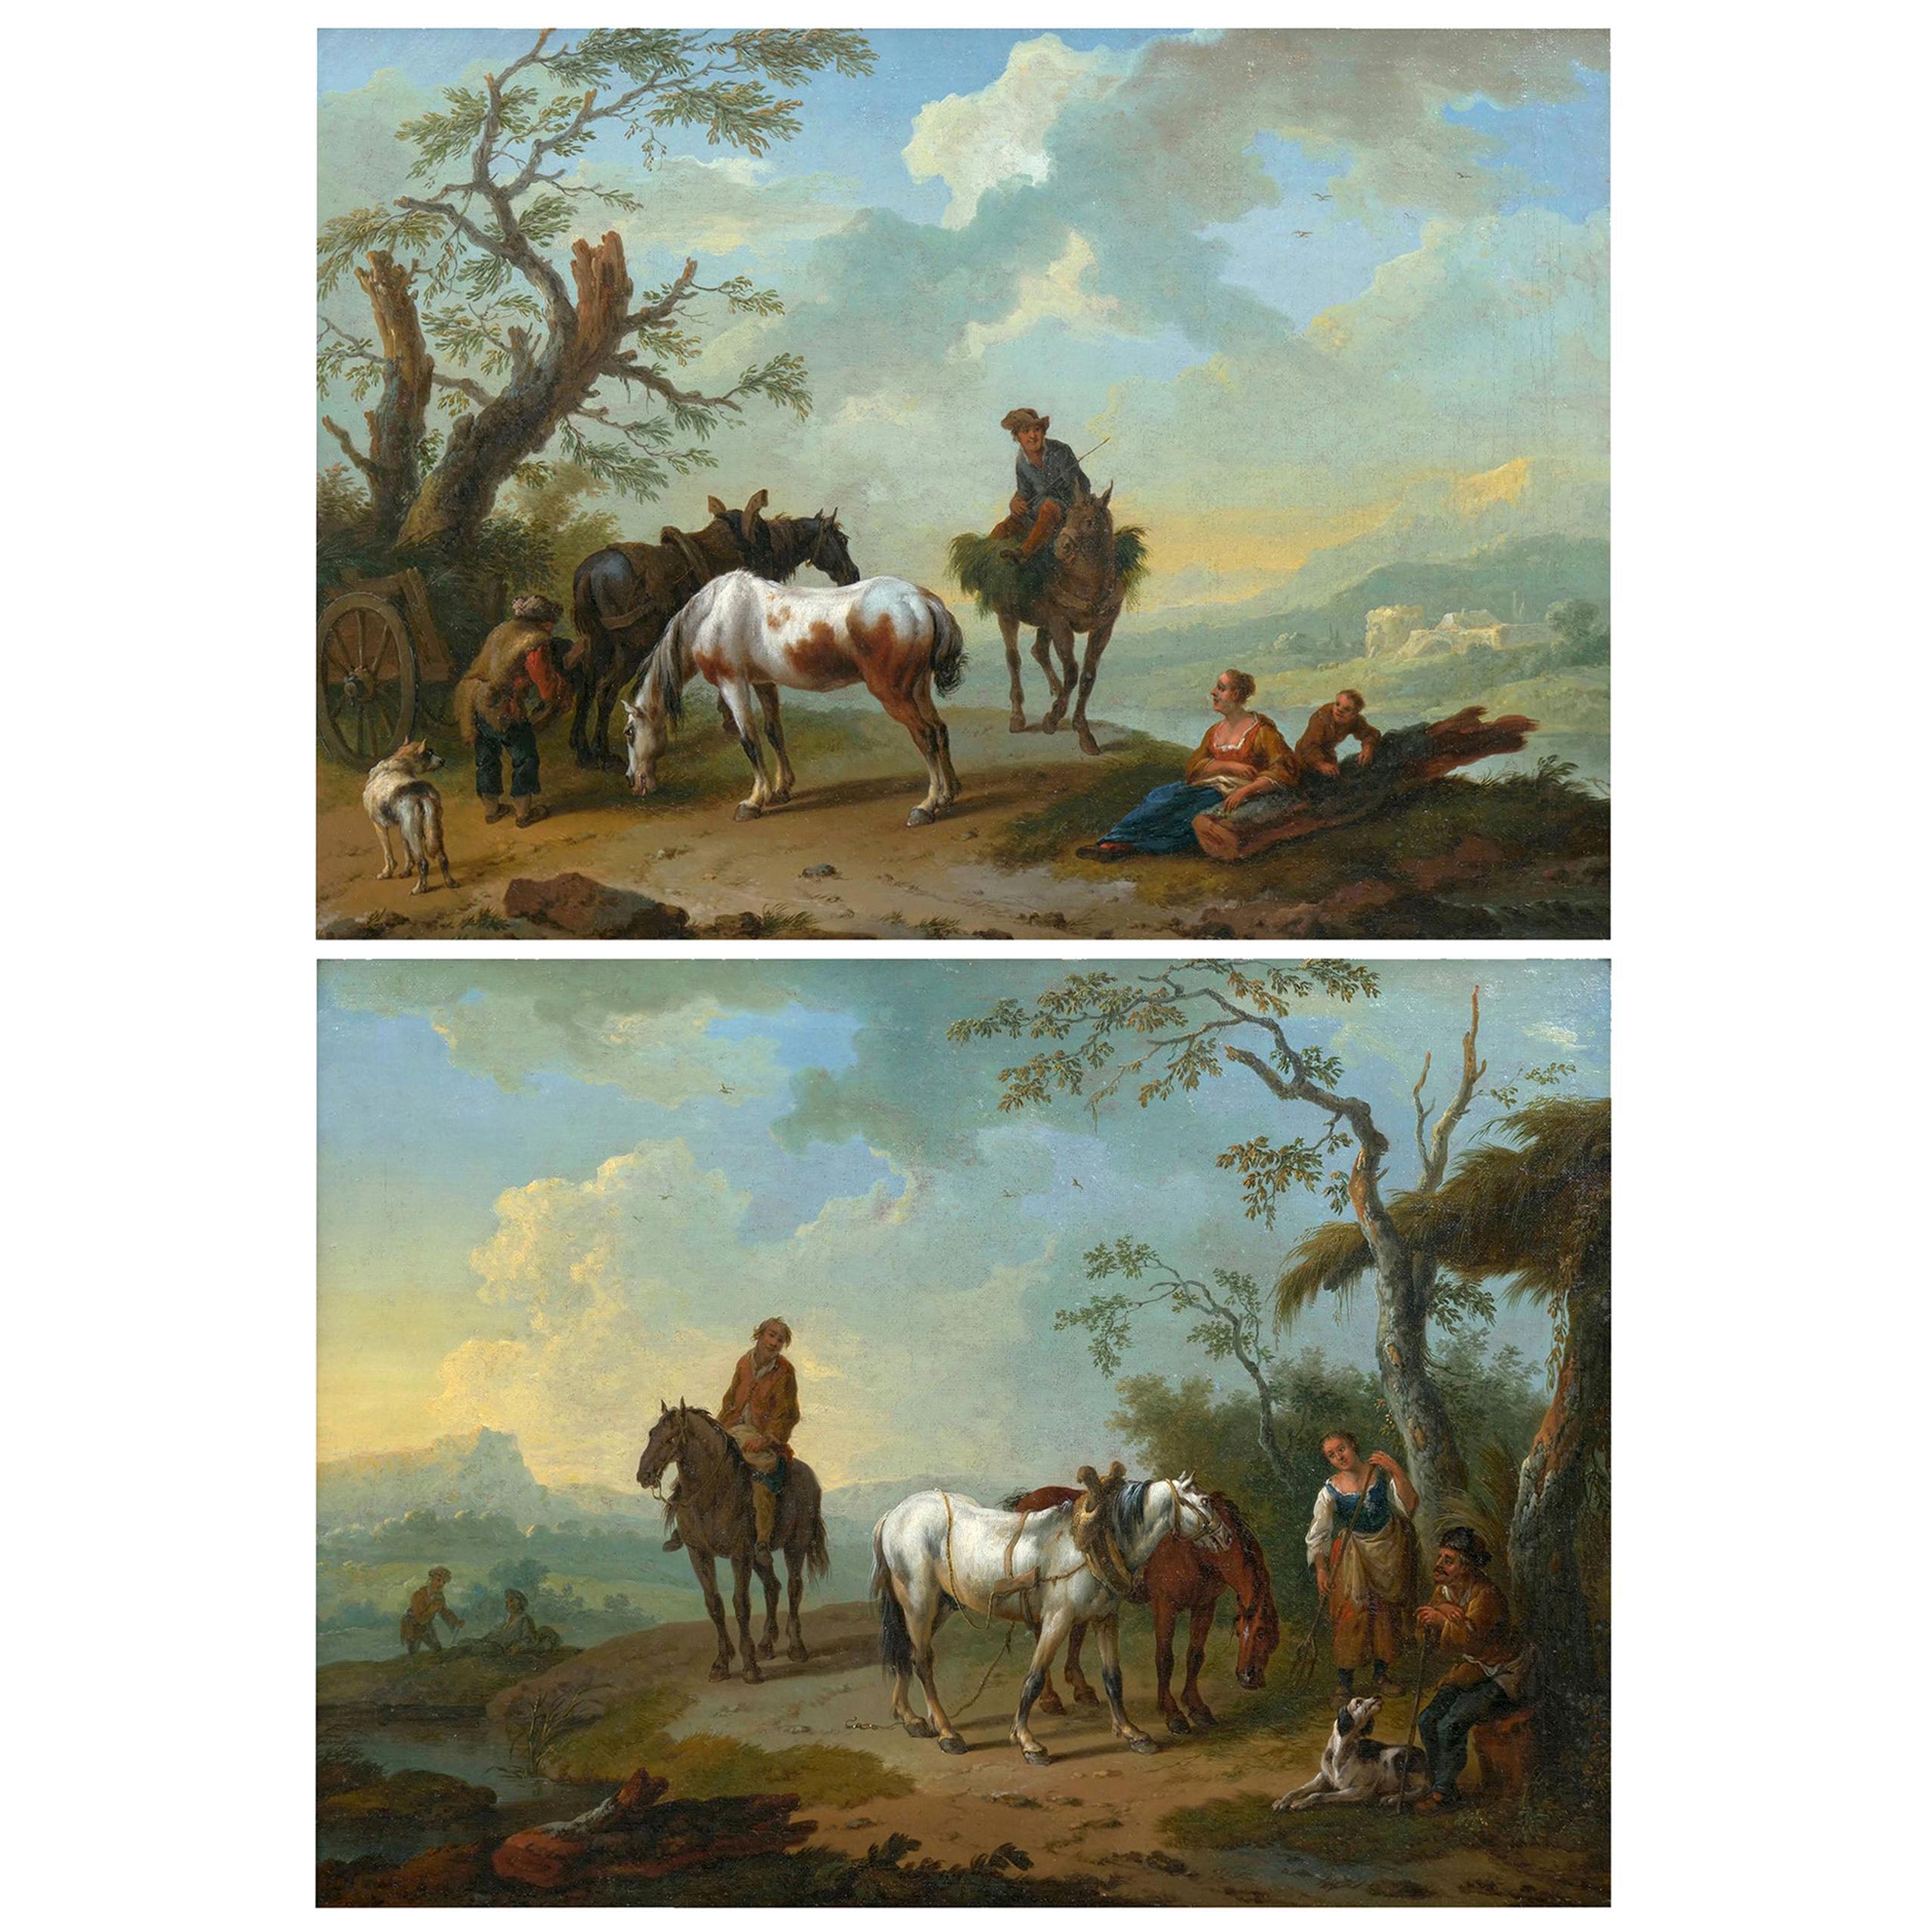 Antique Landscape Paintings Attributed to Pieter van Bloemen, 18th Century, Pair